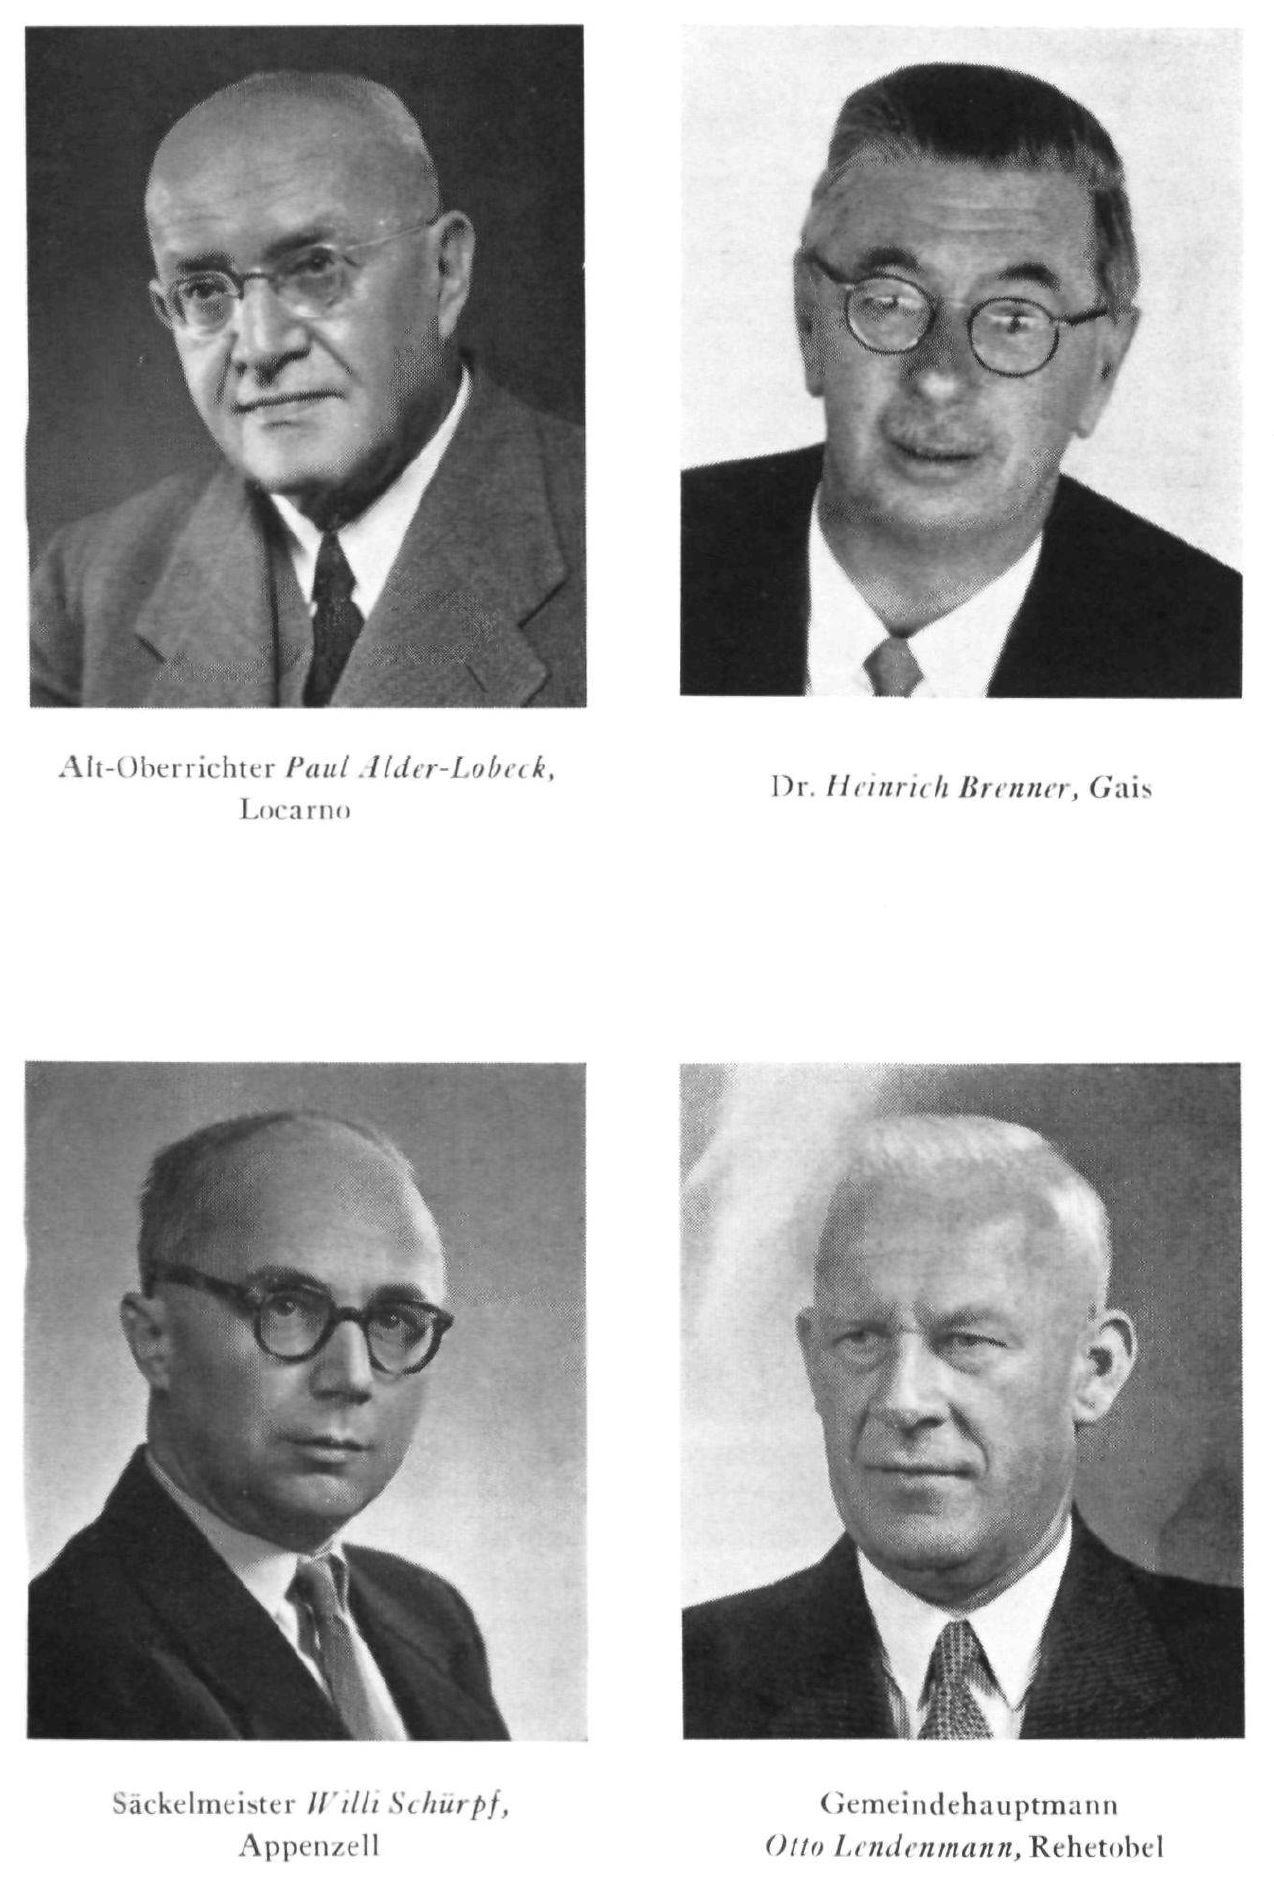 Willi Schürpf (1904-1961)